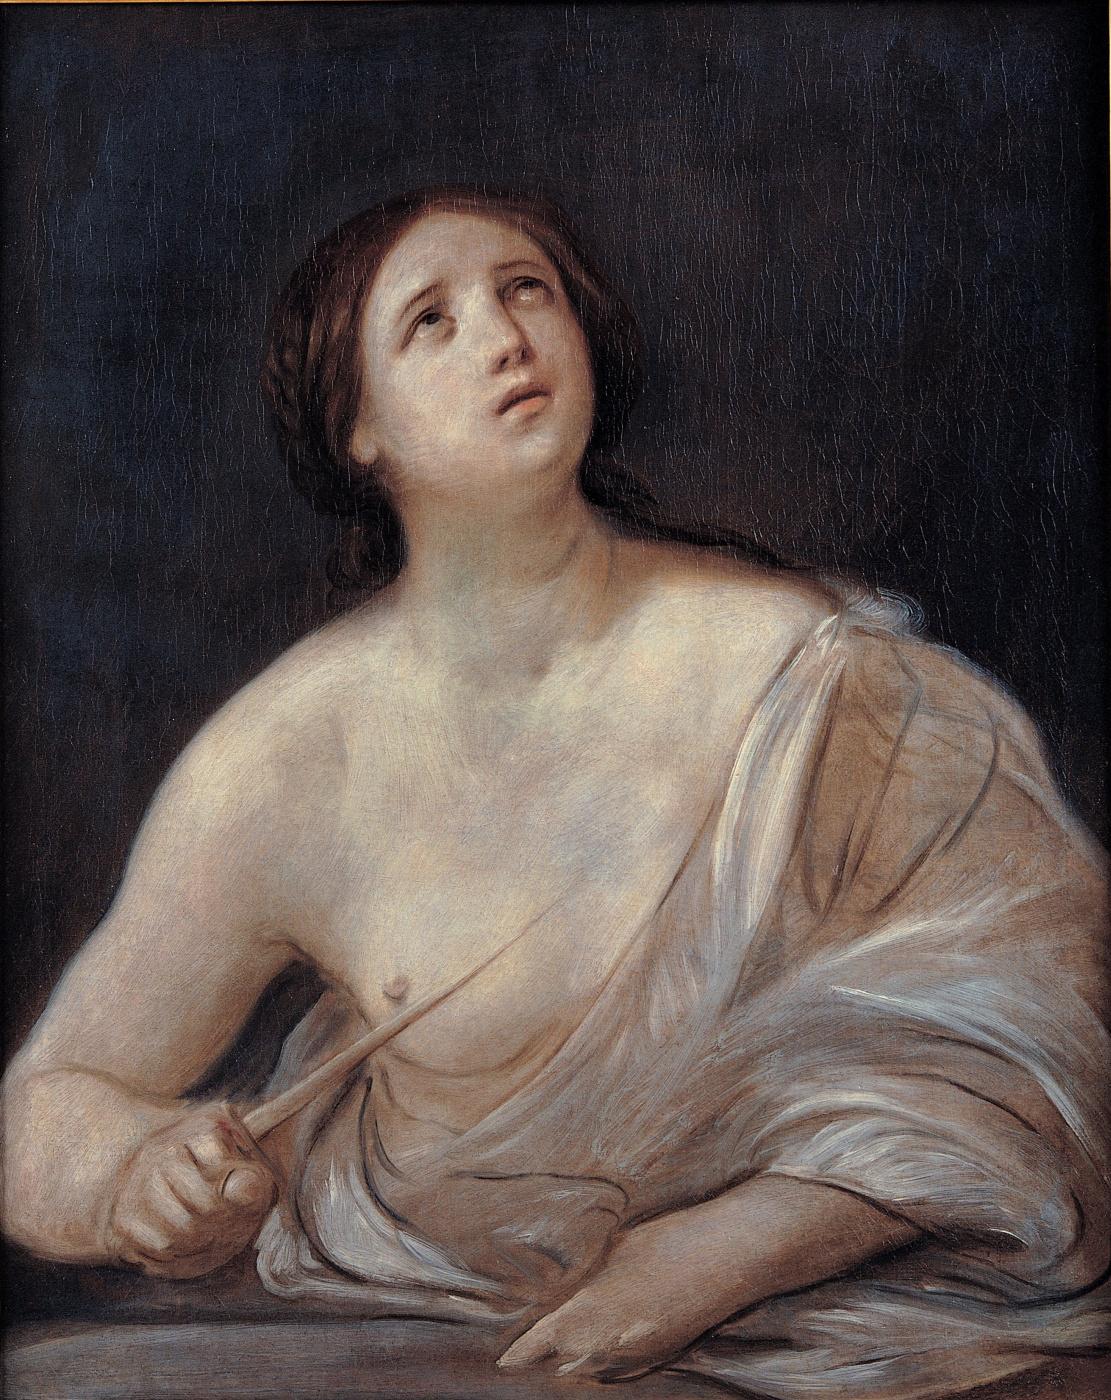 Guido Reni. The Death Of Lucretia